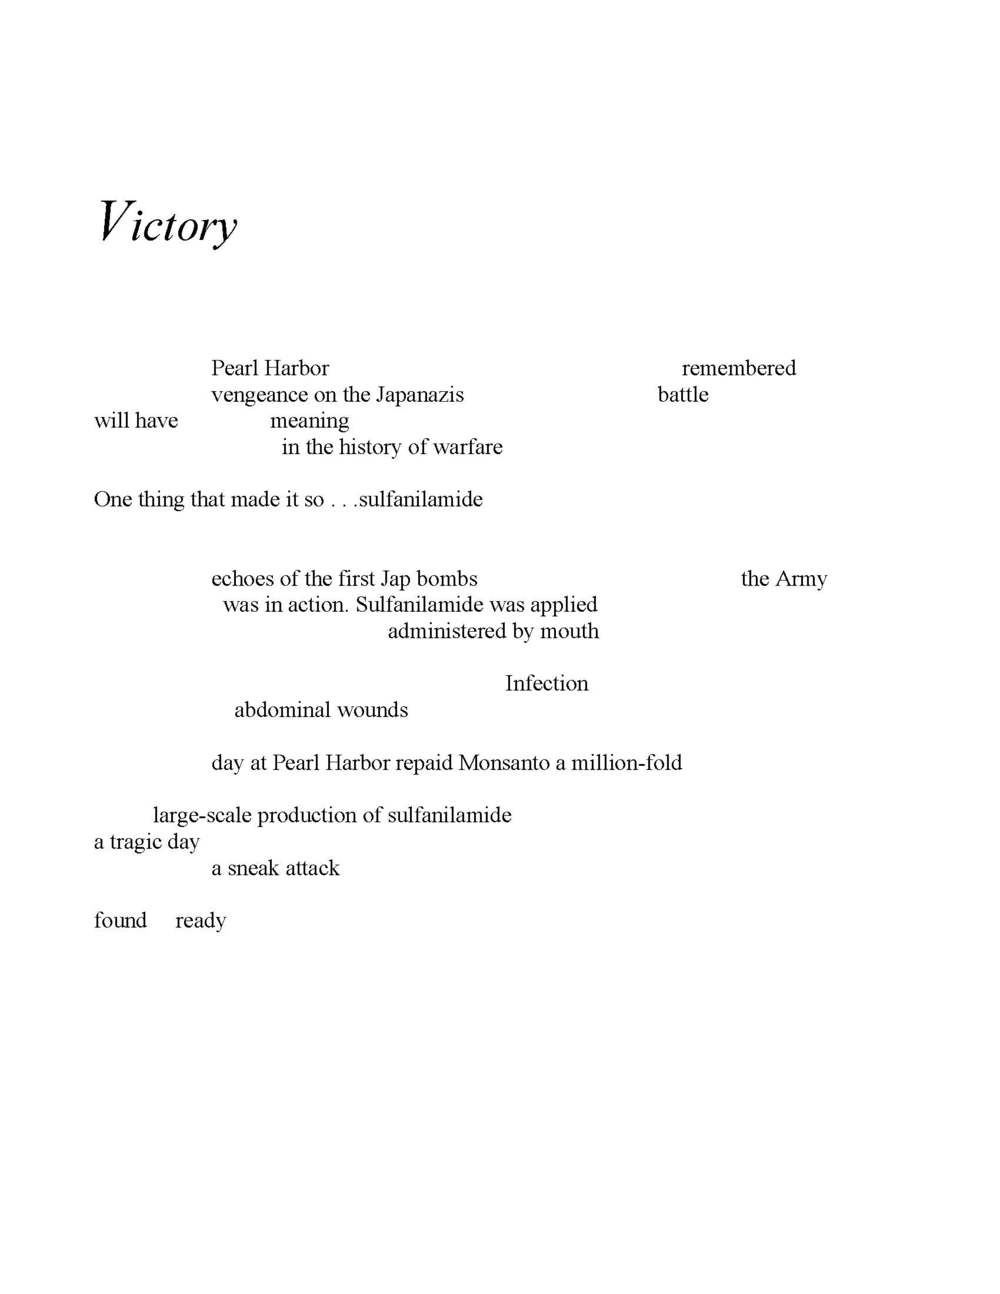 Victory_text.jpg